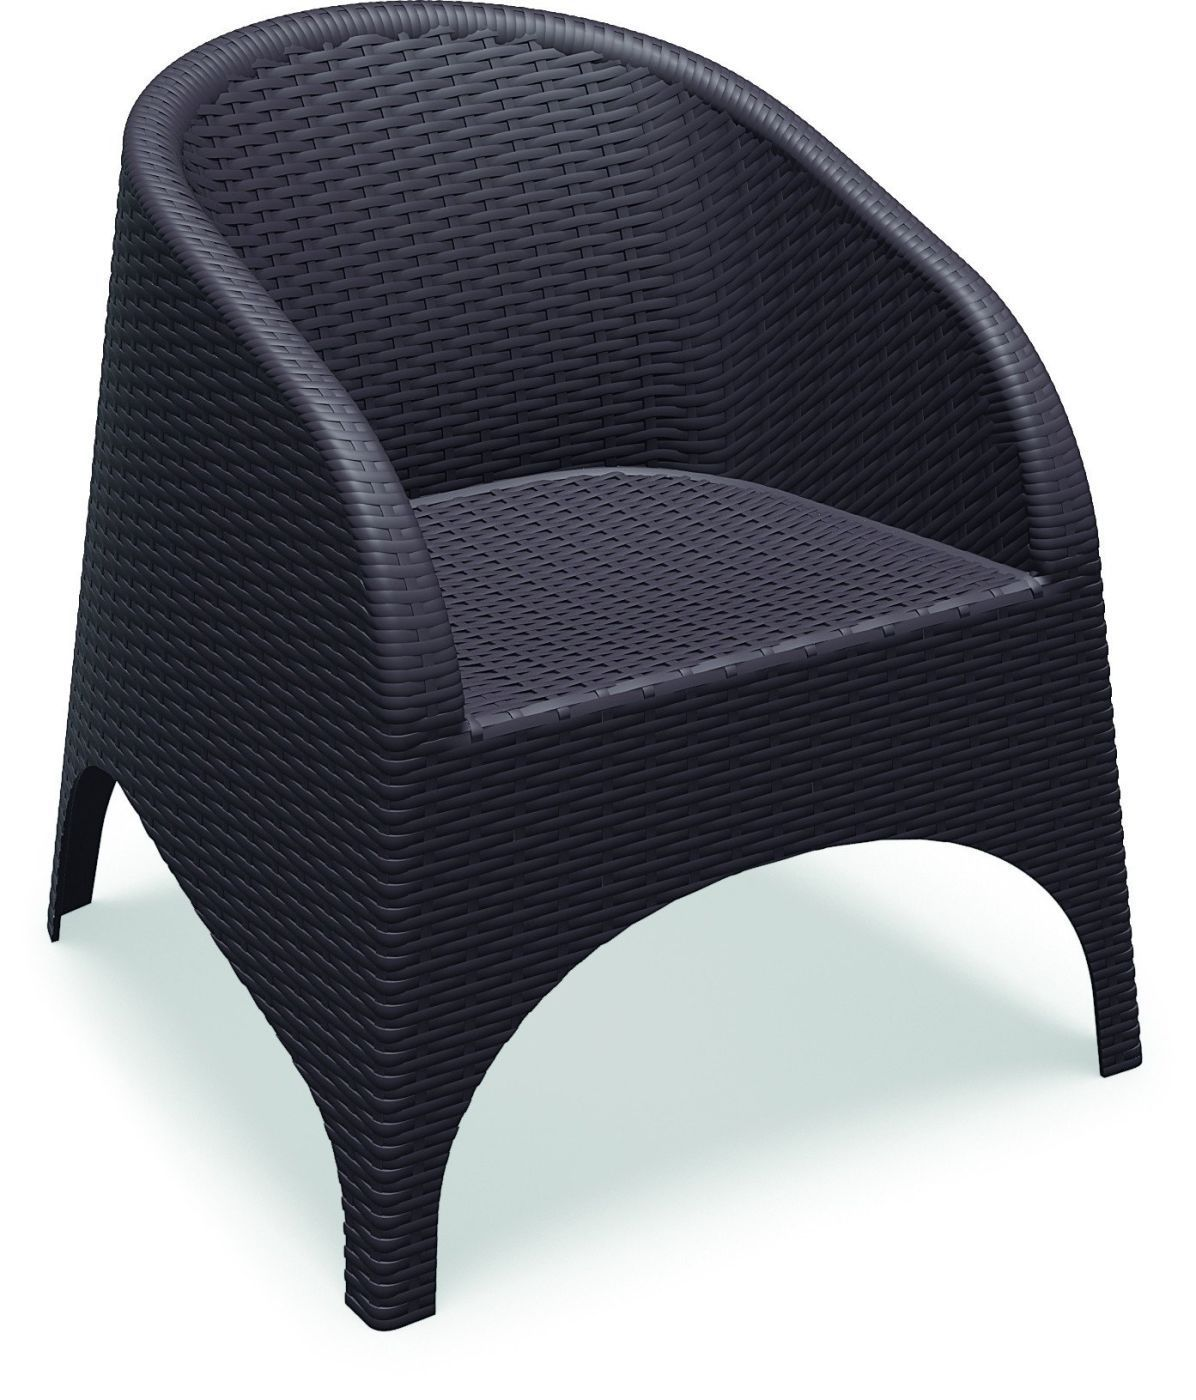 Aruba Resin Wickerlook Chair Brown Set Of 2 Outdoor Dining Chairs Patio Chairs Resin Patio Chairs